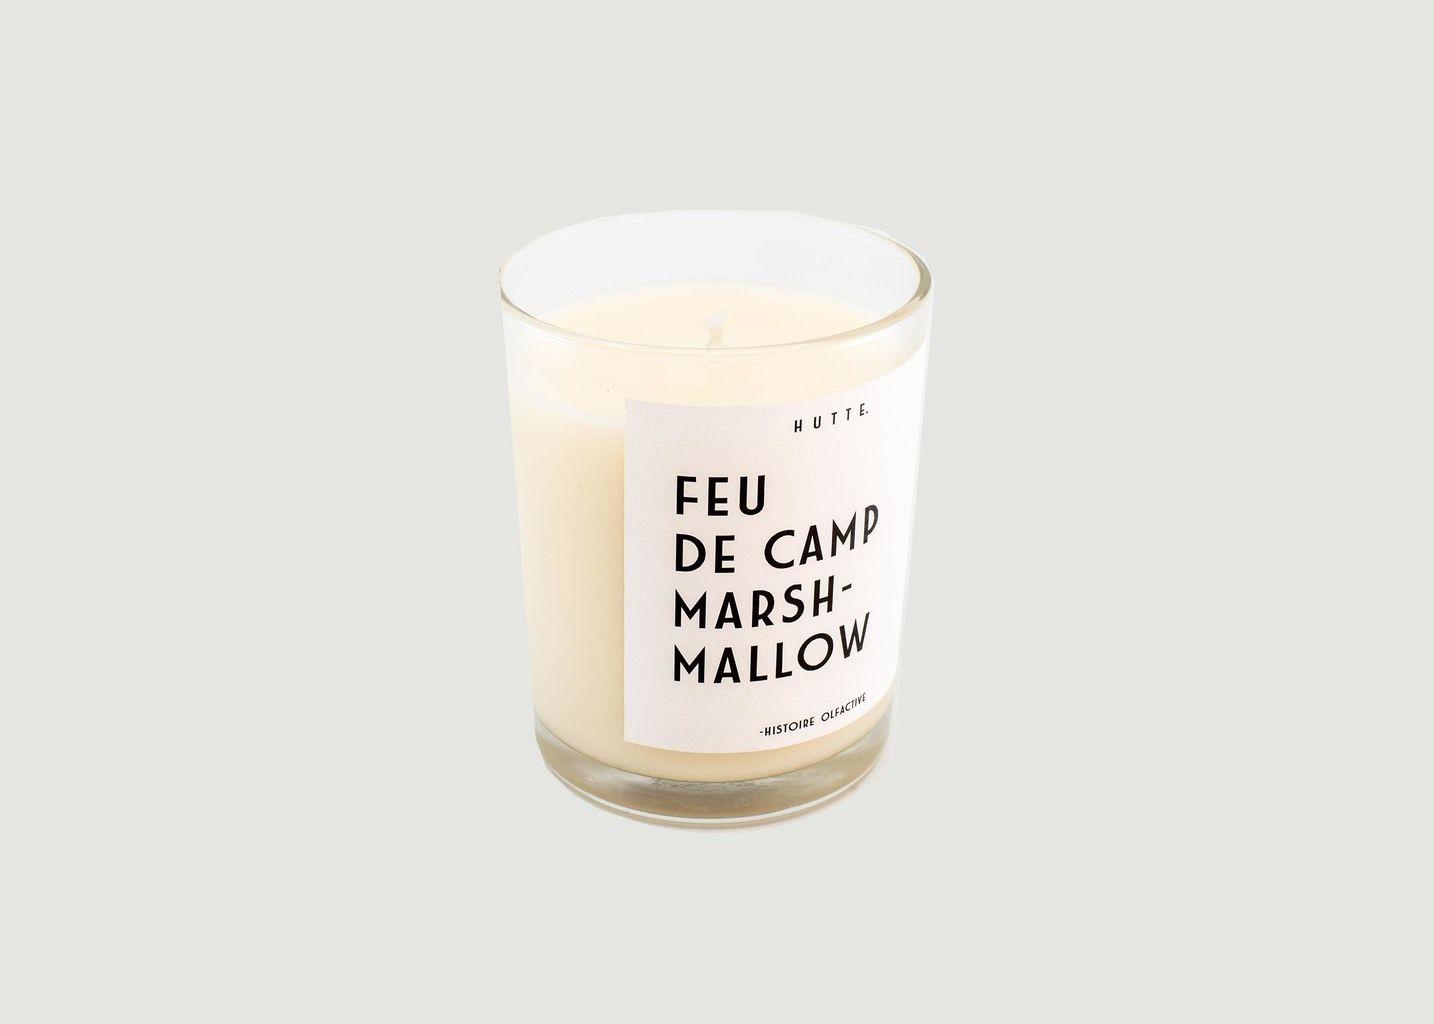 Bougie parfumée Feu De Camp Marshmallow - Hutte